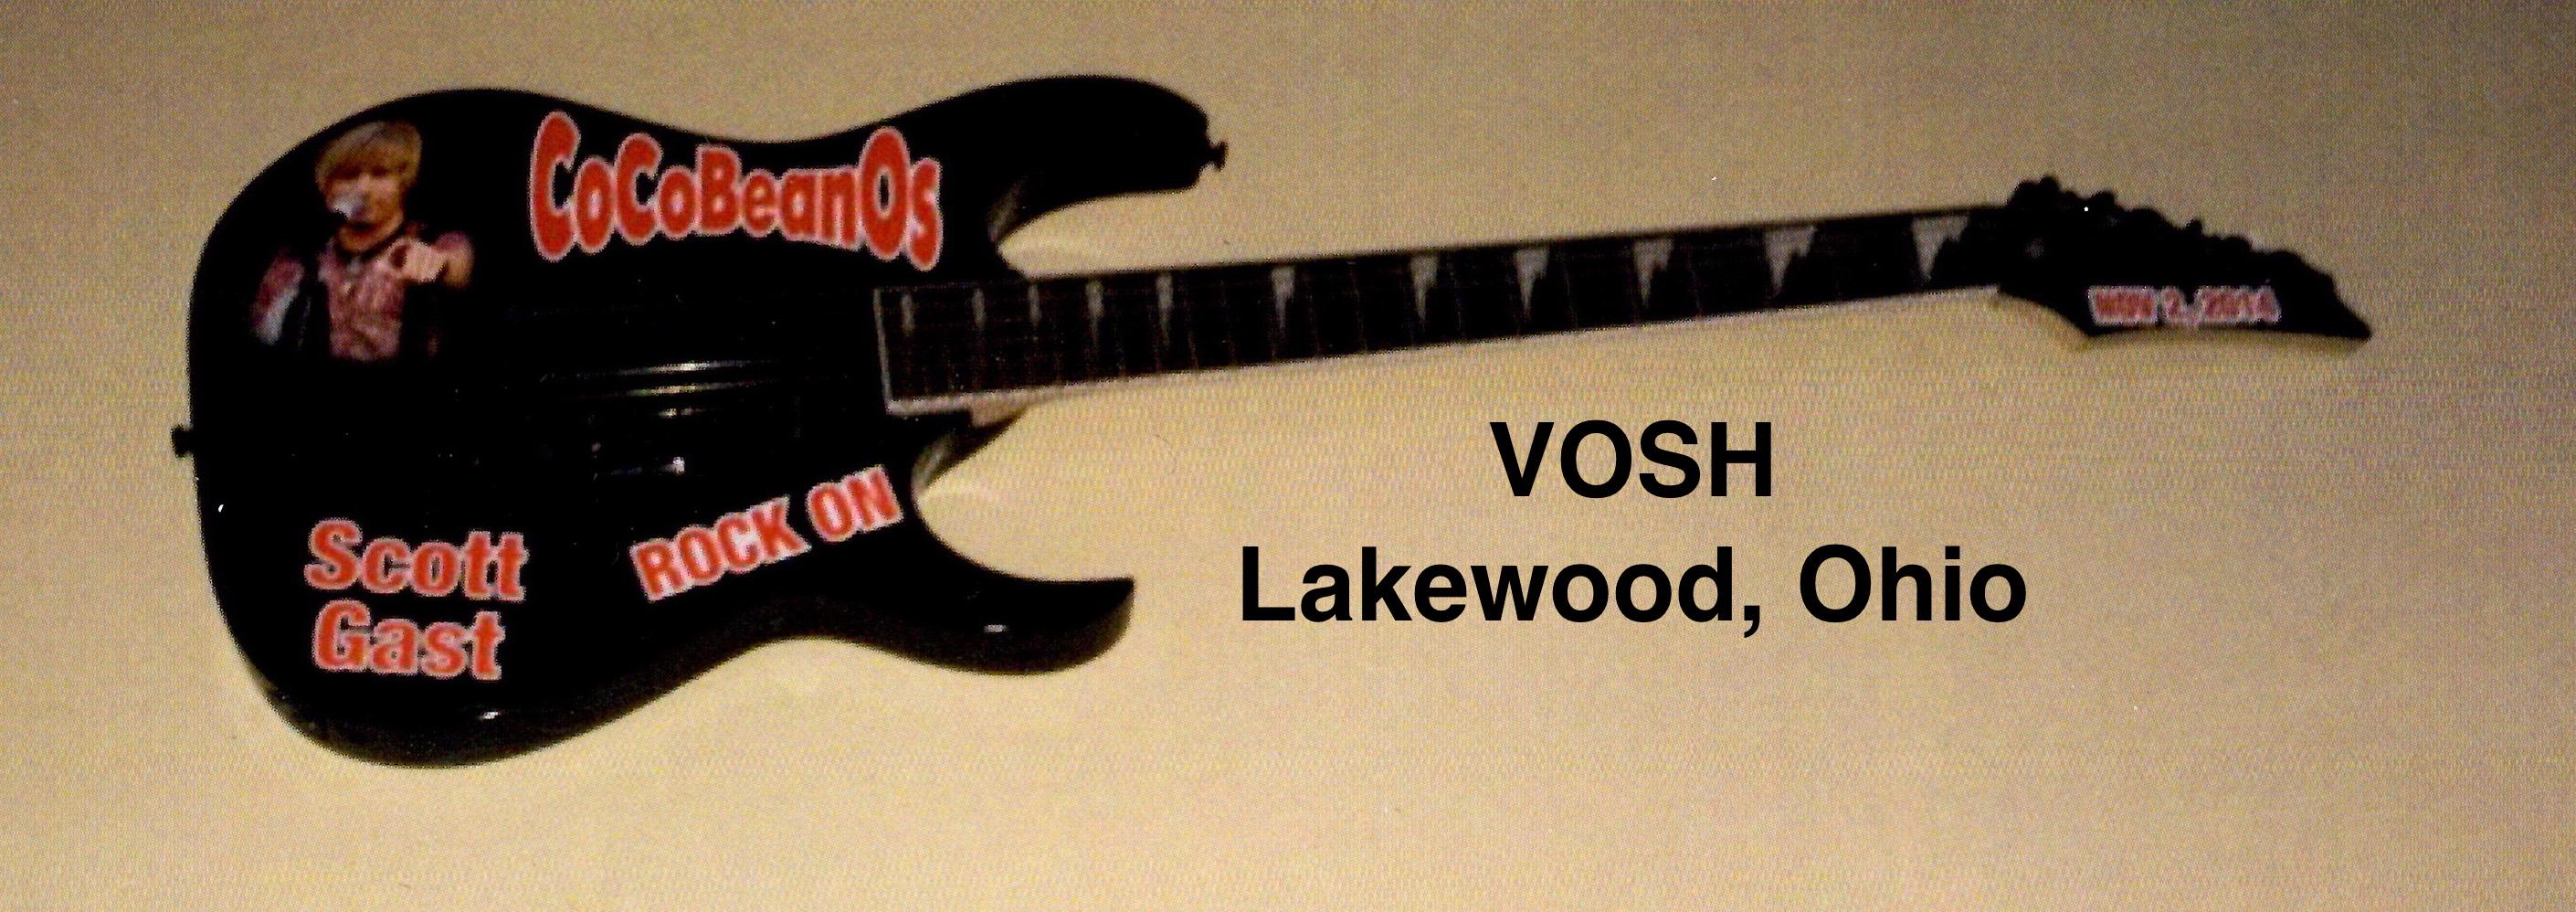 VOSH - Lakewood OH